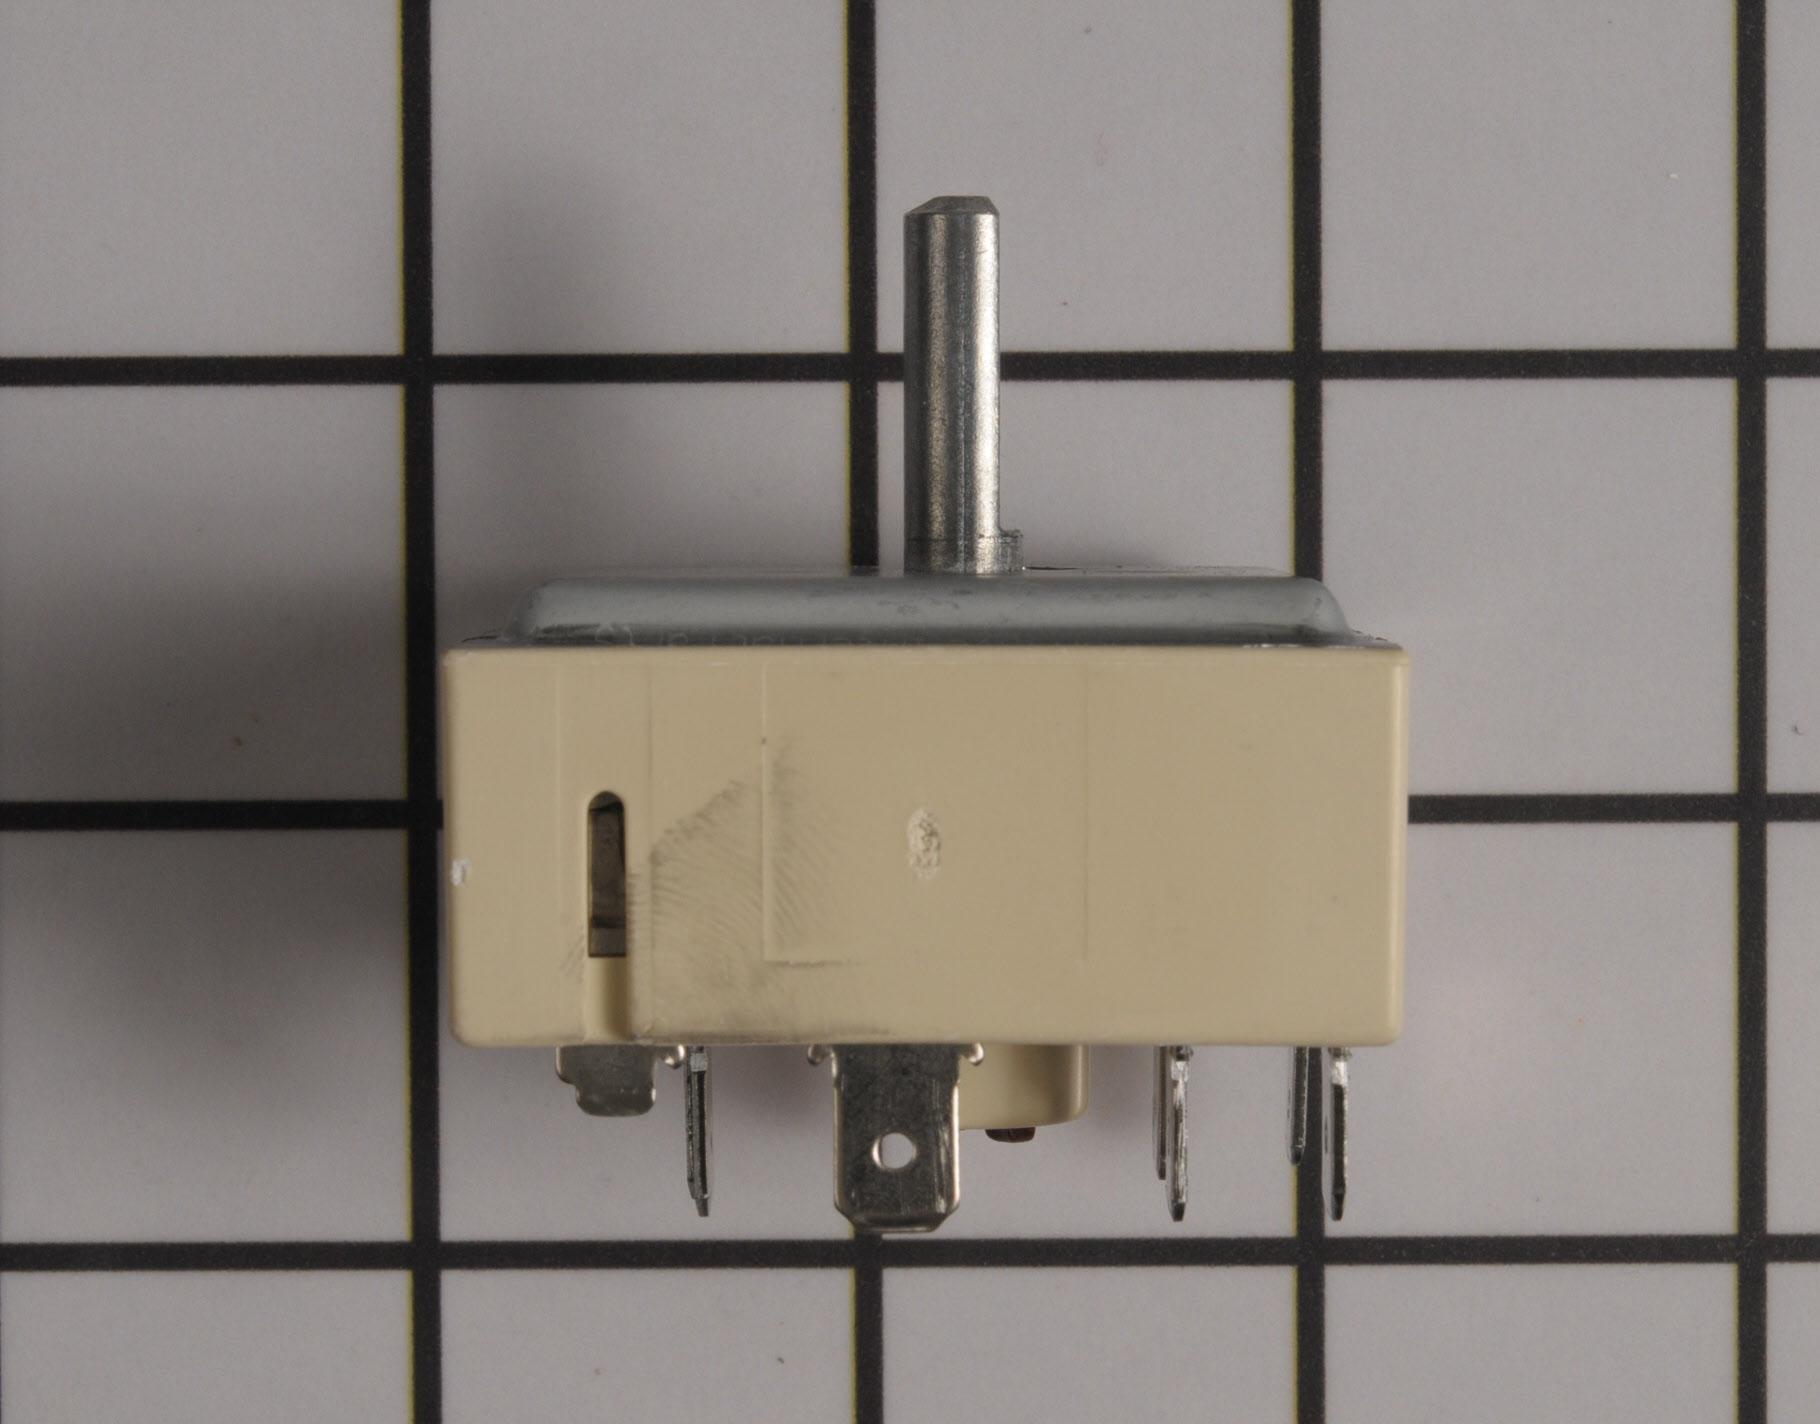 Ikea Range/Stove/Oven Part # WPW10441696 - Surface Element Switch